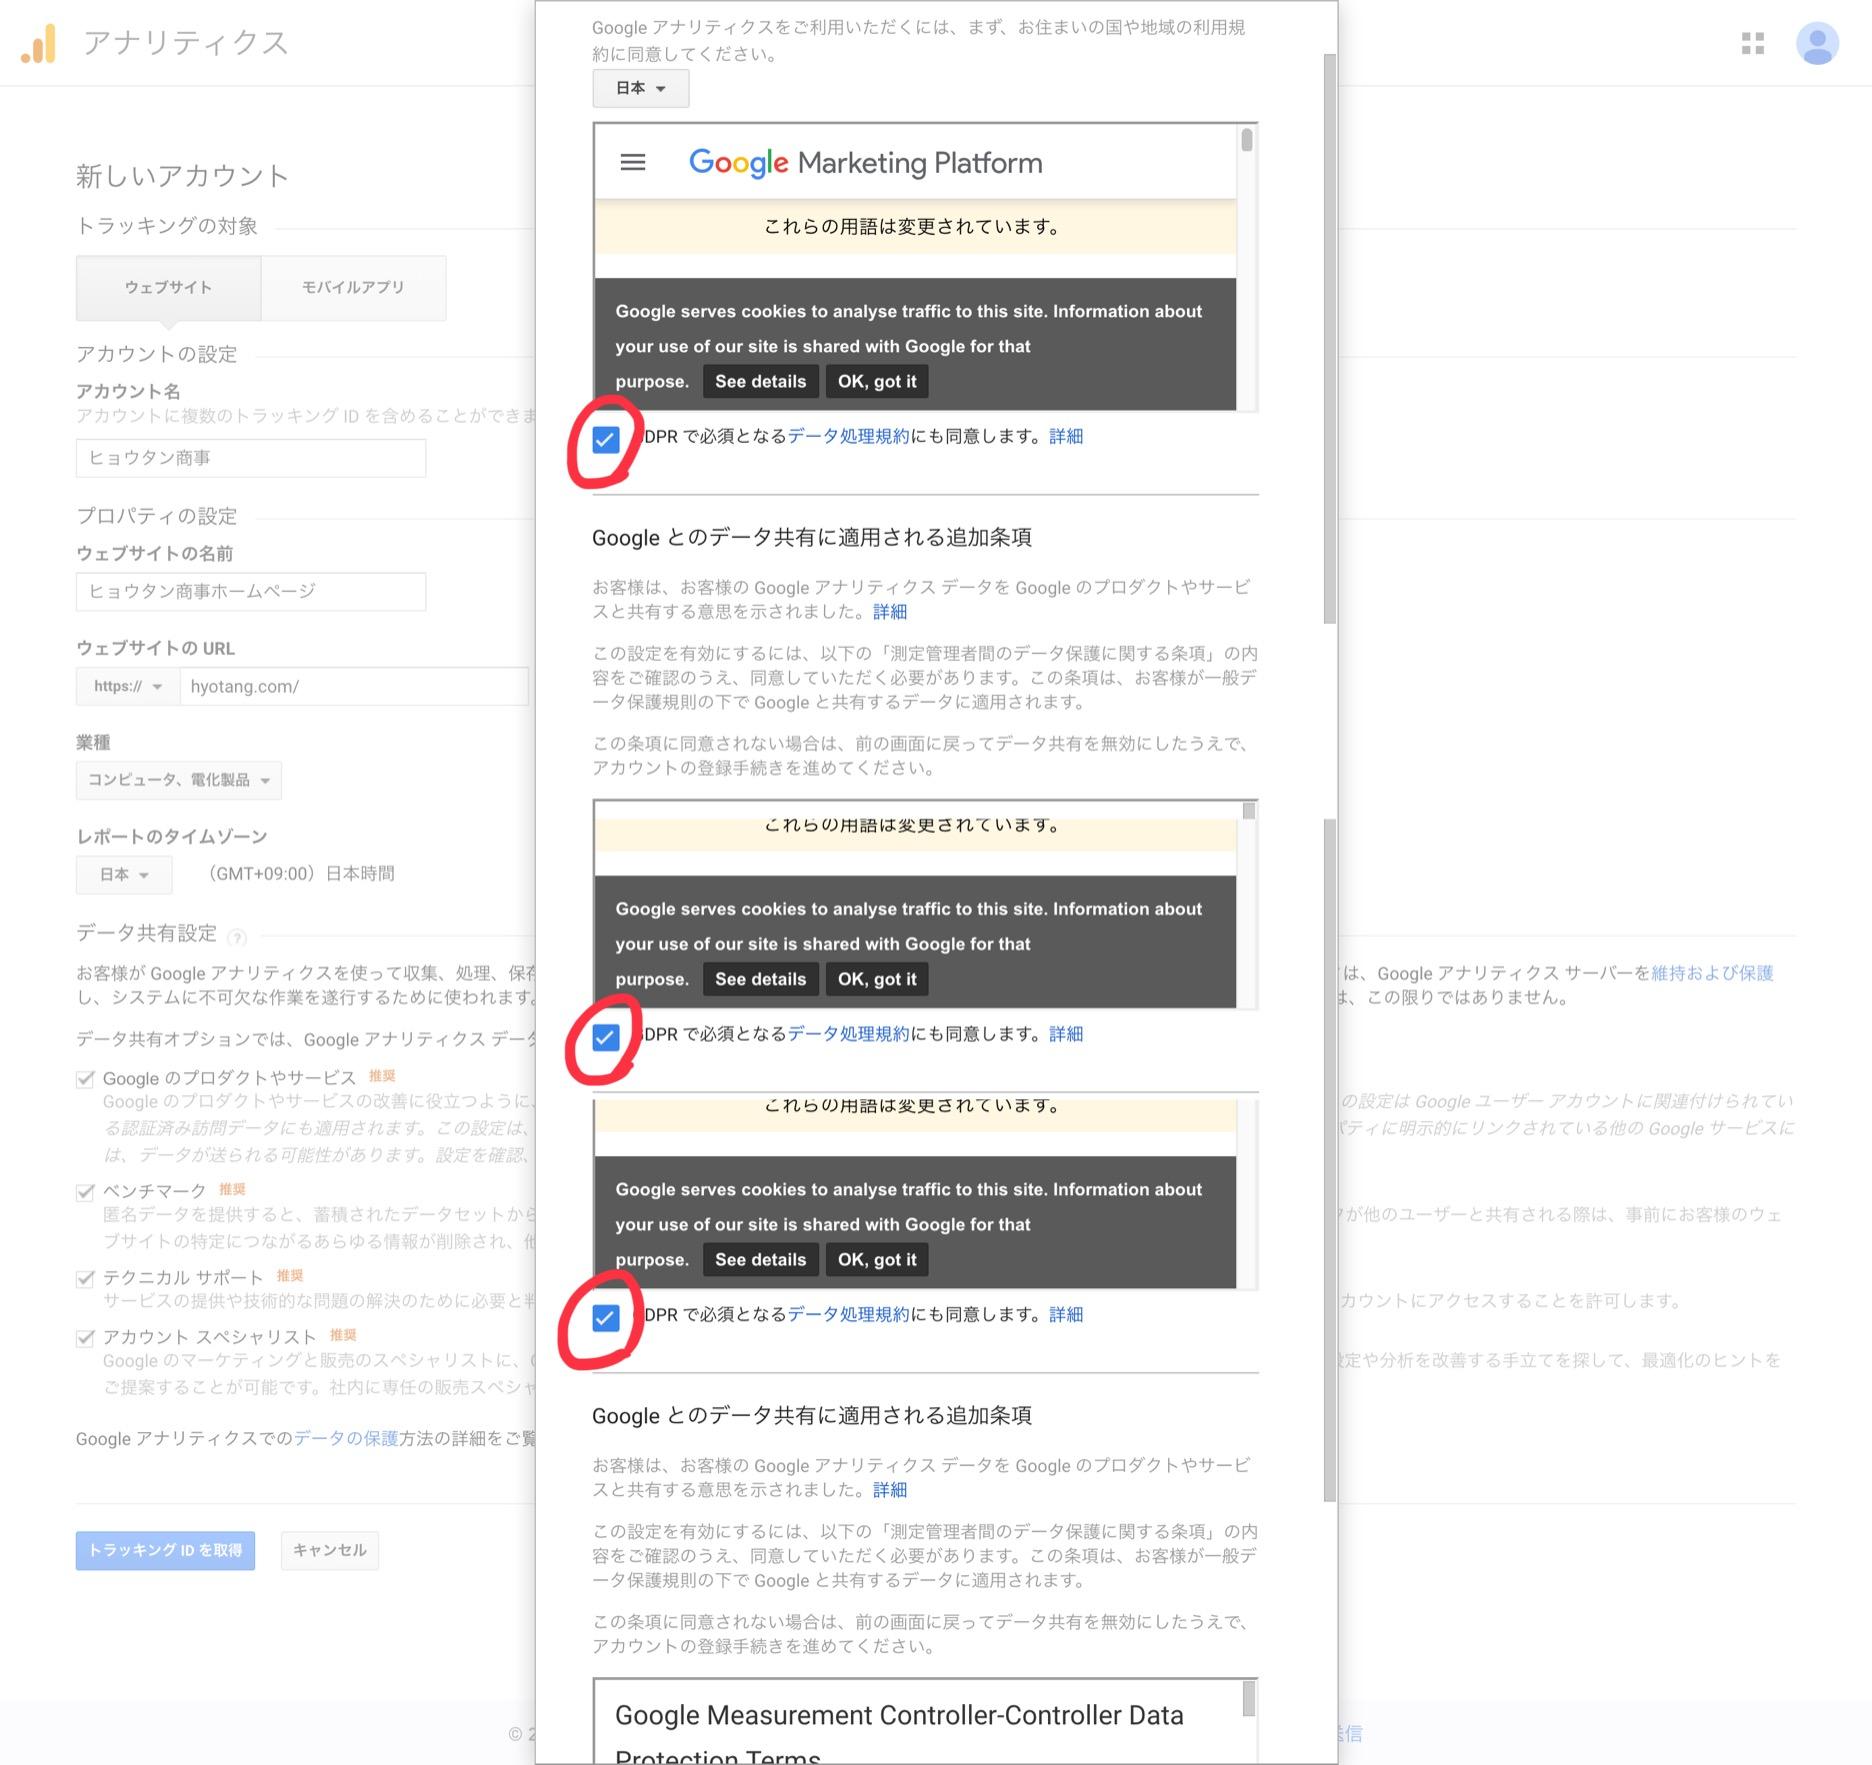 Google Analytics利用規約